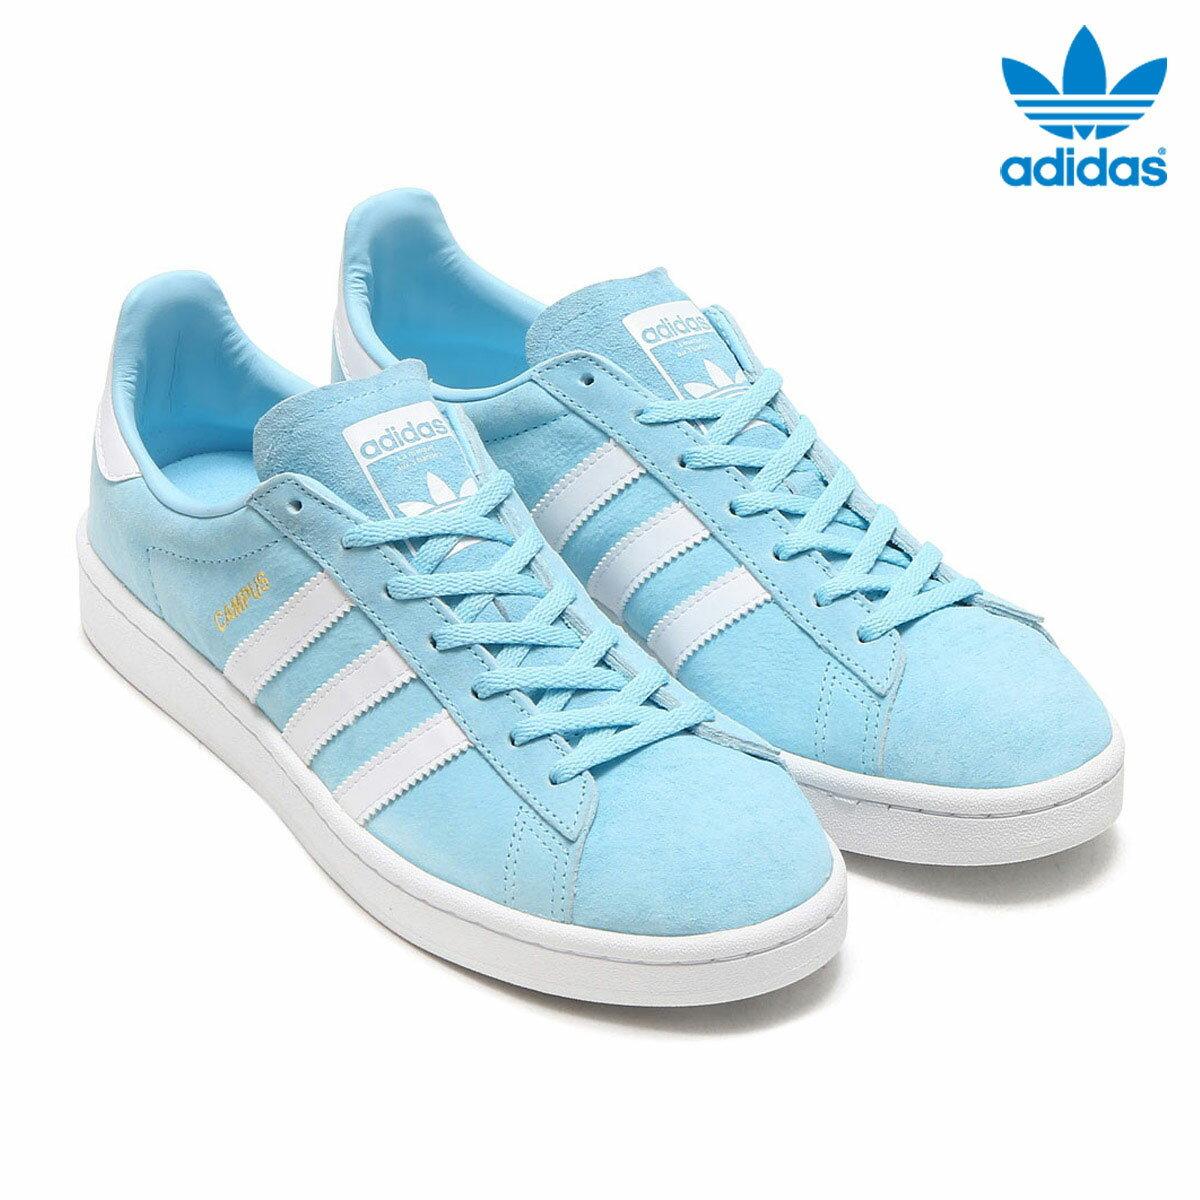 adidas Originals CAMPUS W(アディダス オリジナルス キャンパス W)(Ice Blue/Running White/Crystal White) 【メンズ レディース スニーカー】17FW-I